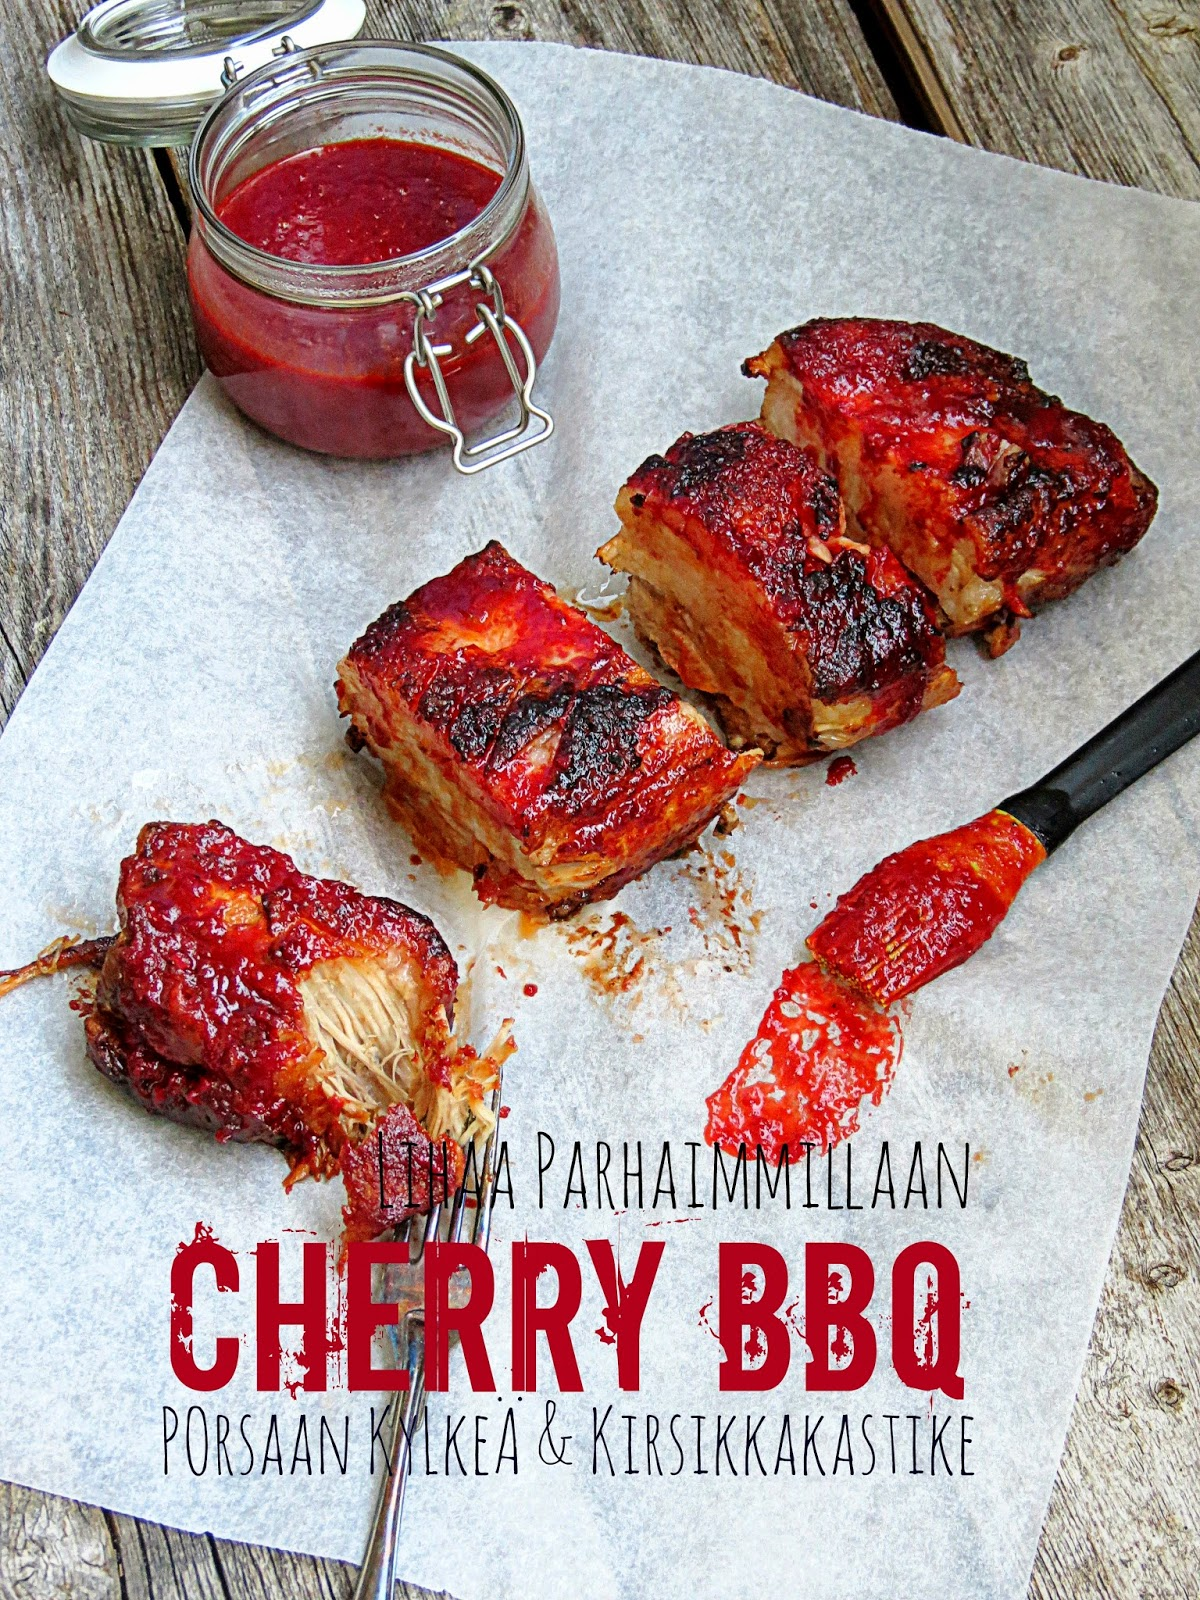 Lihaa parhaimmillaan: Cherry BbQ possua